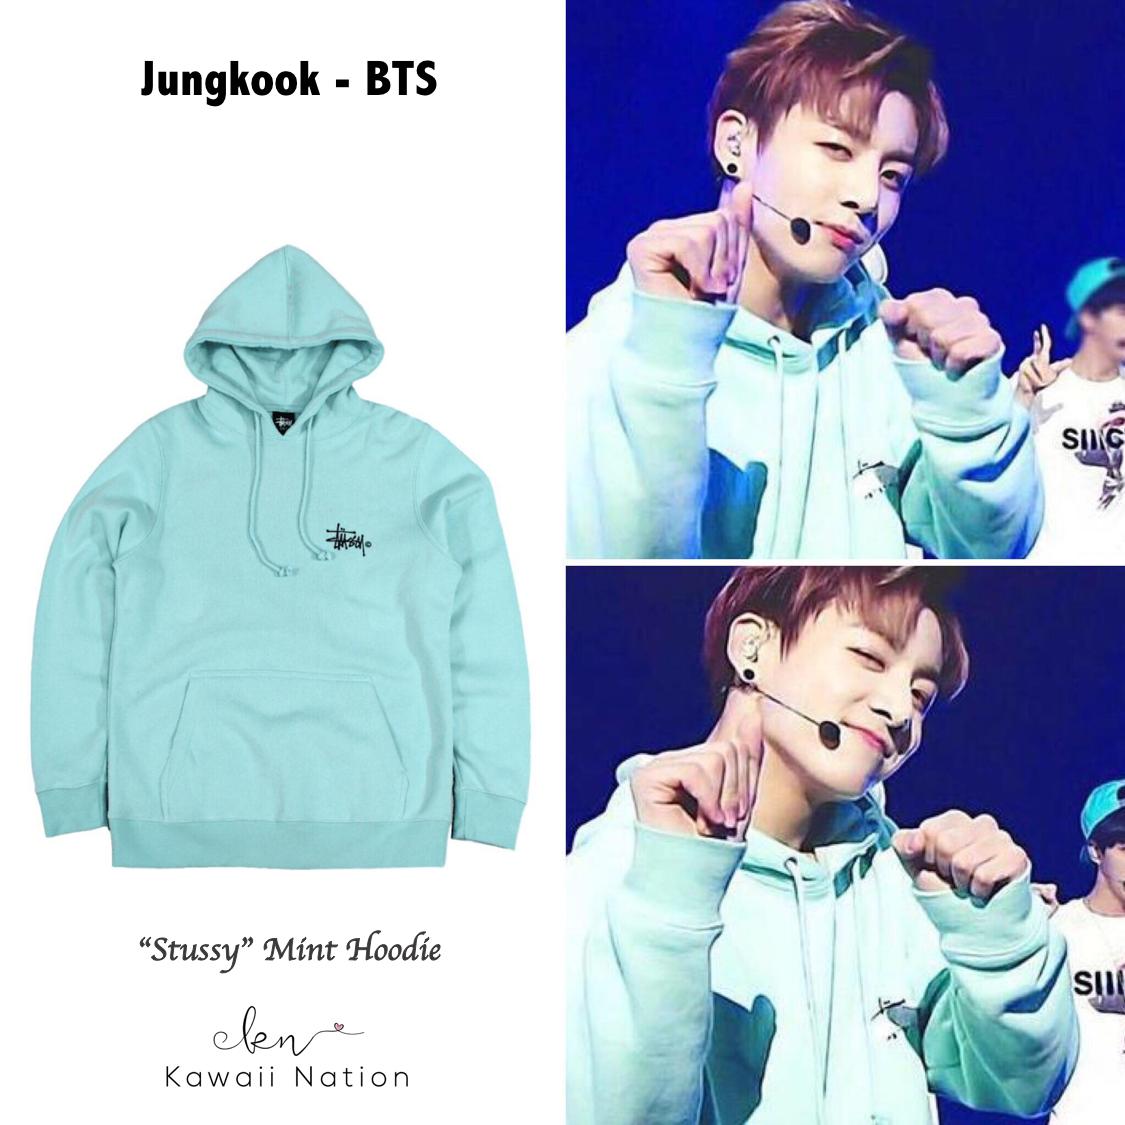 Bts Fashion Inspired Outfits V Tae Hyung Jungkook Rm Rap Monsta Jin Jimin Jhope Suga Kawaii Nation Celebs Kpop Tshirt Hoodie Idol Bt2 Ropa Bts Ropa Ropa Tumblr